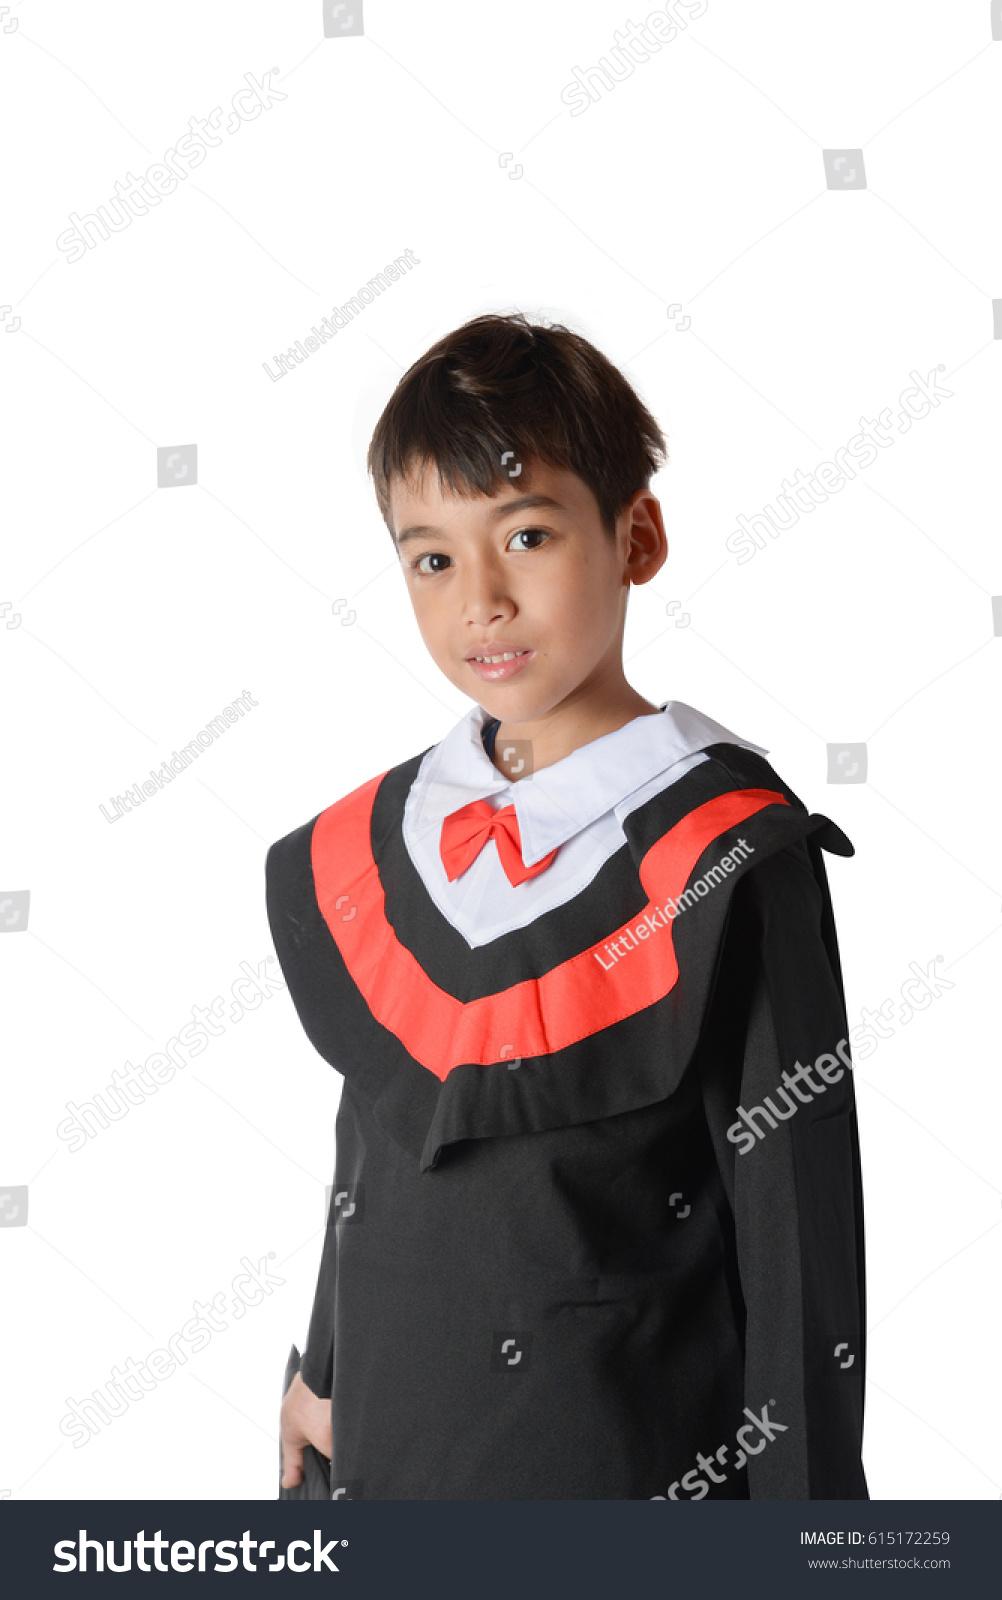 Boy Graduation Gown Bachelor Robe Cap Stock Photo (Edit Now ...